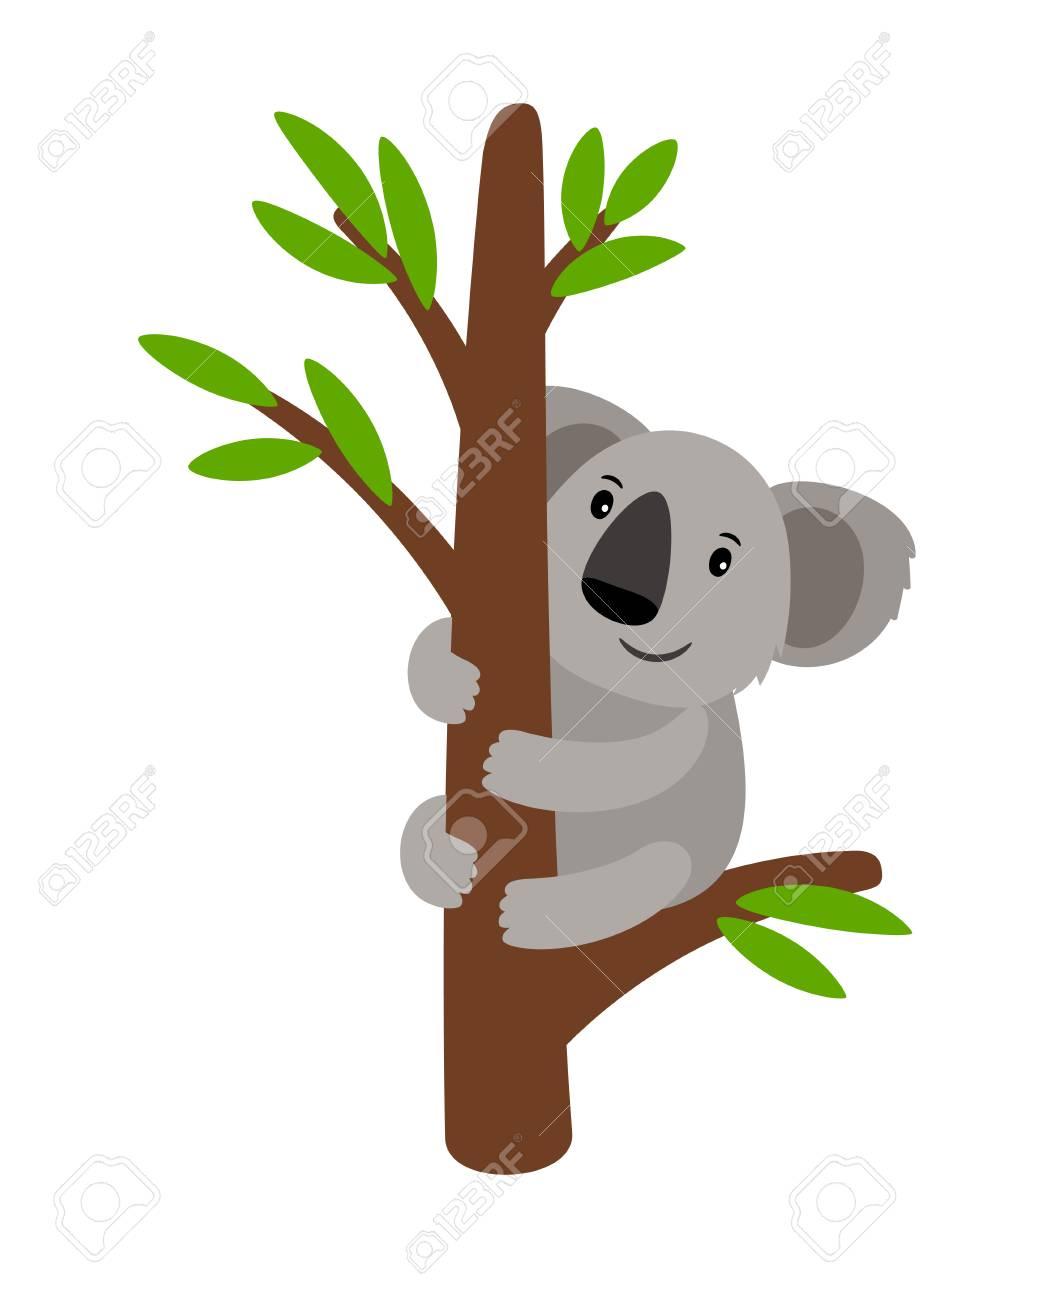 Grey koala bear on a tree cartoon animal icon isolated on white background, vector illustration - 99146280